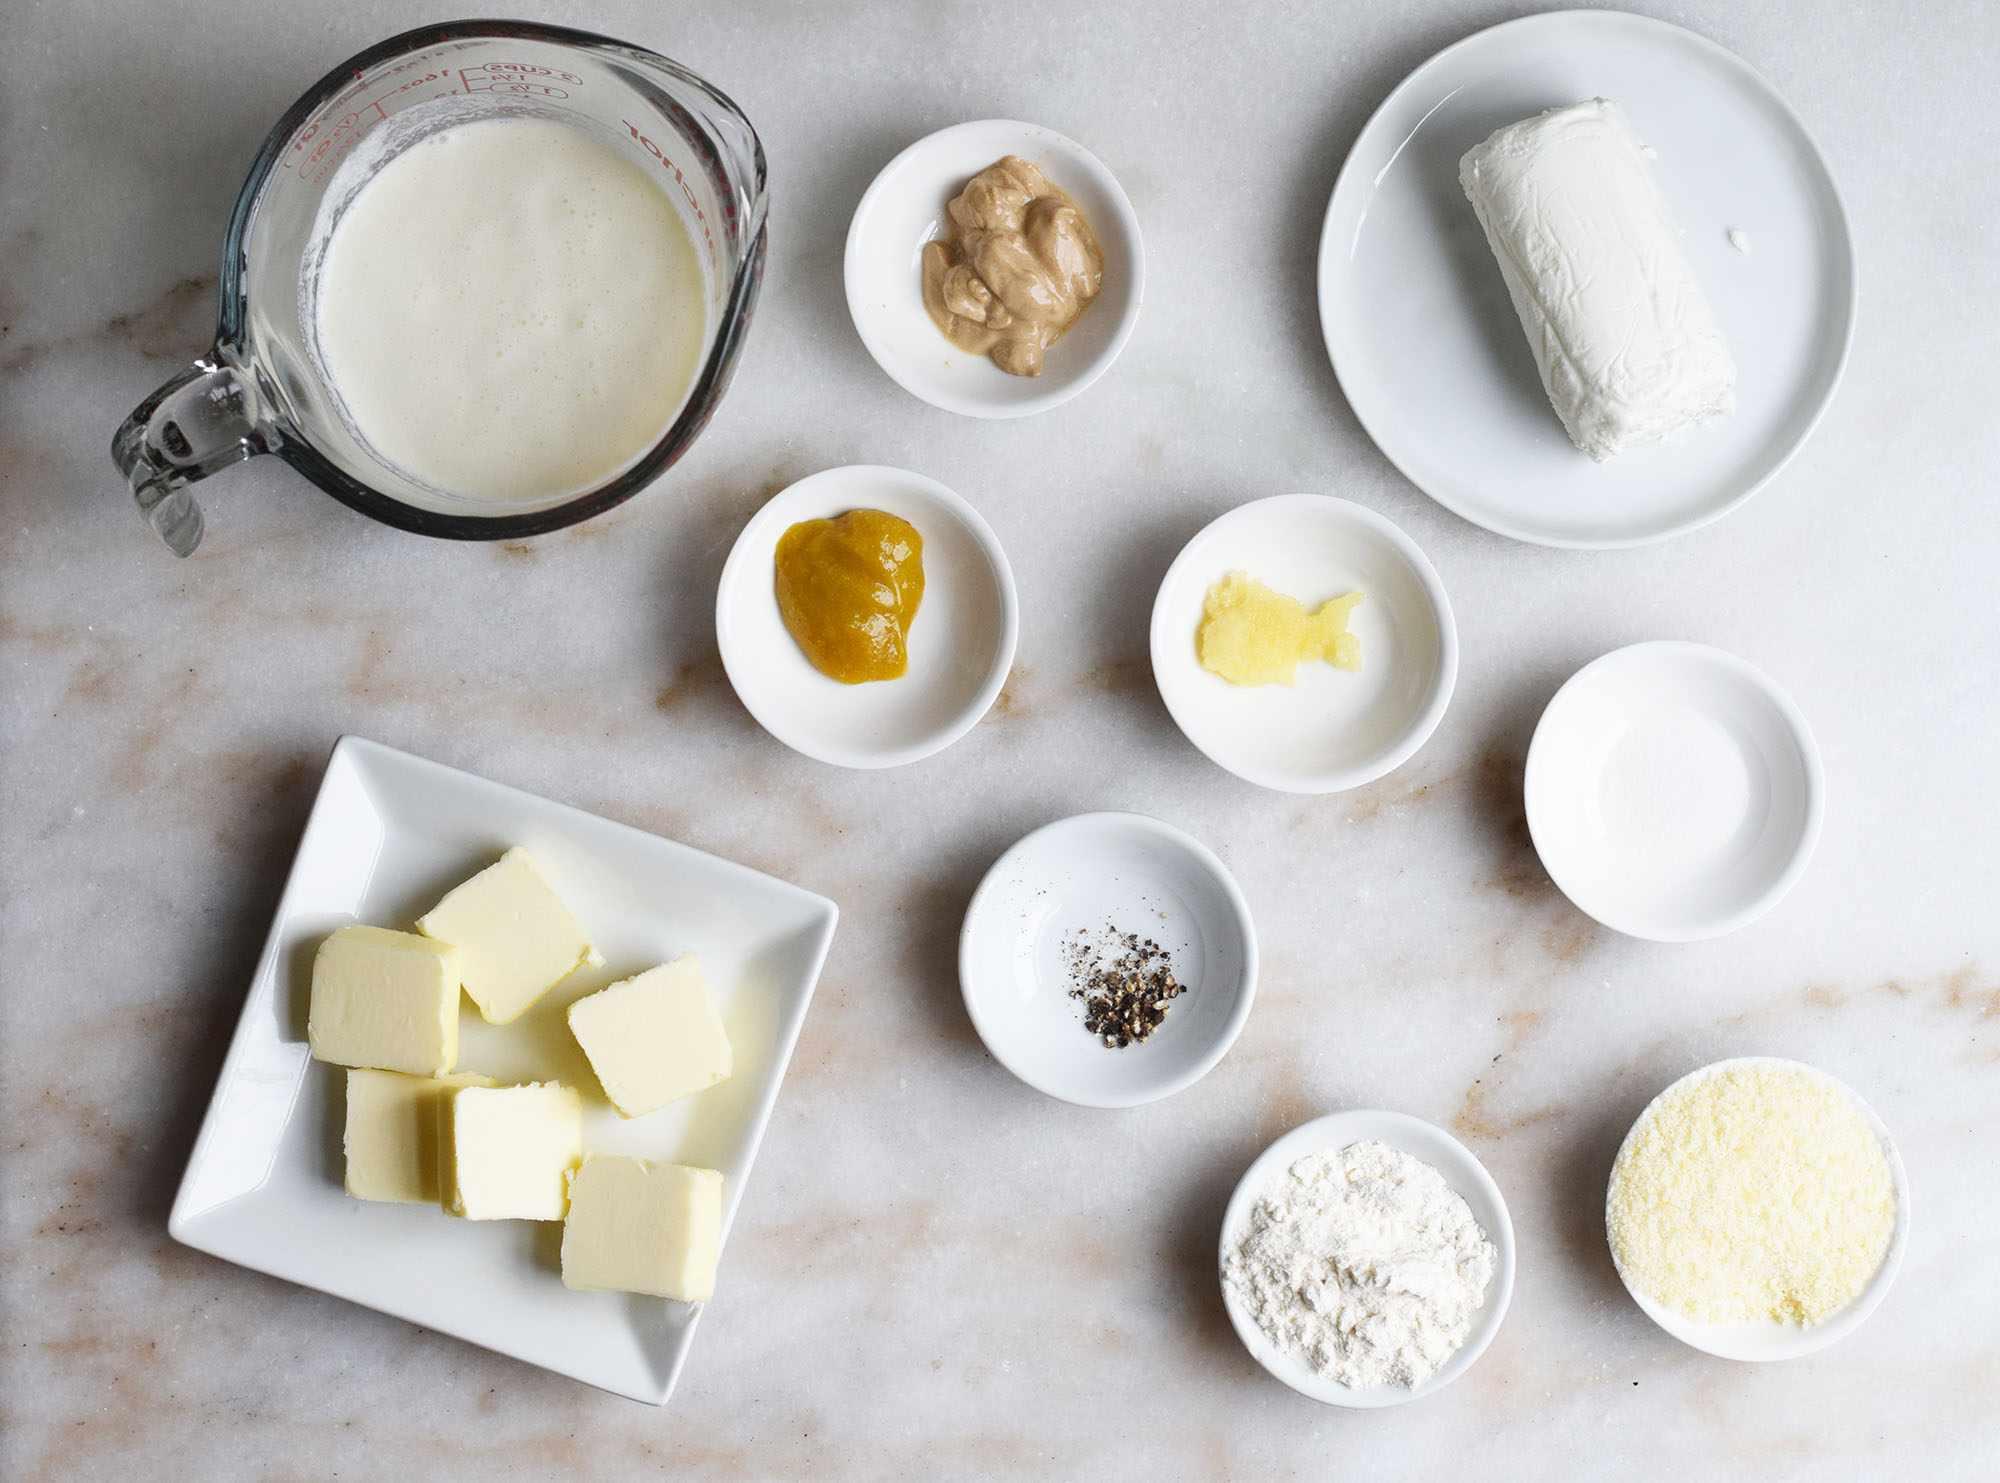 ingredients for chicken cordon bleu sauce